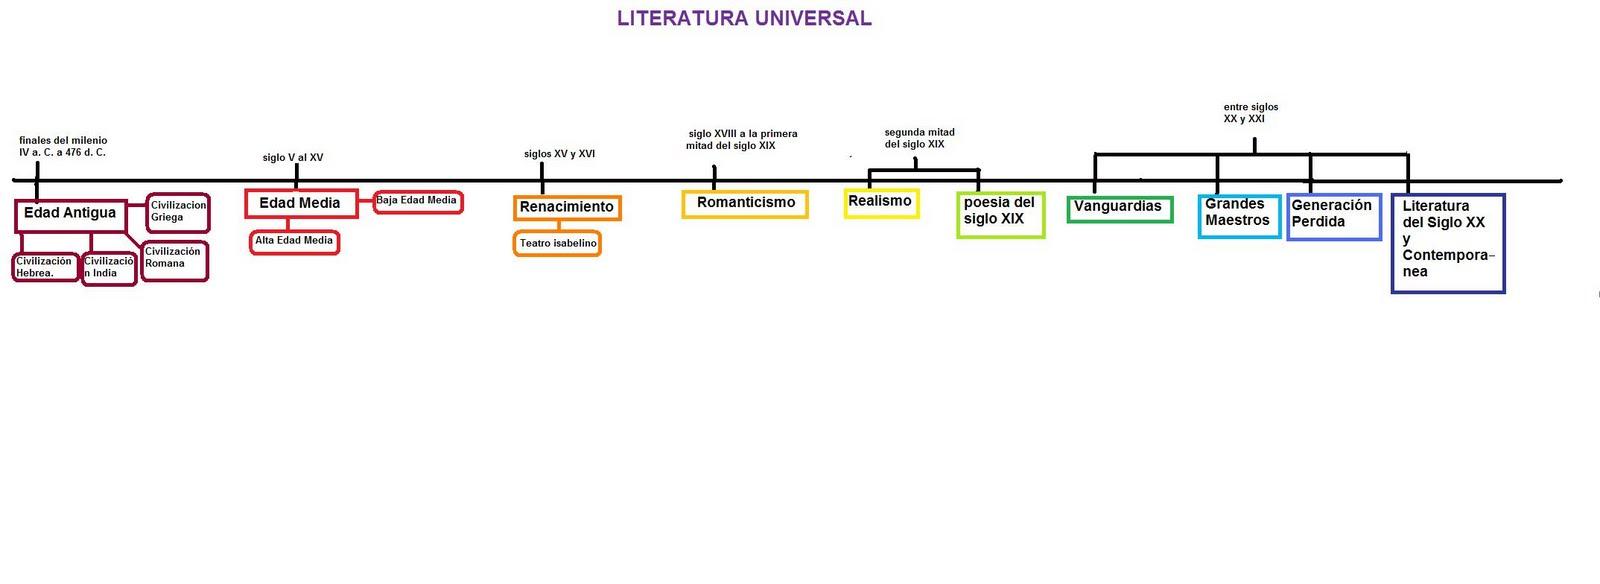 lITERATURA%2BUNIVERSAL.jpg